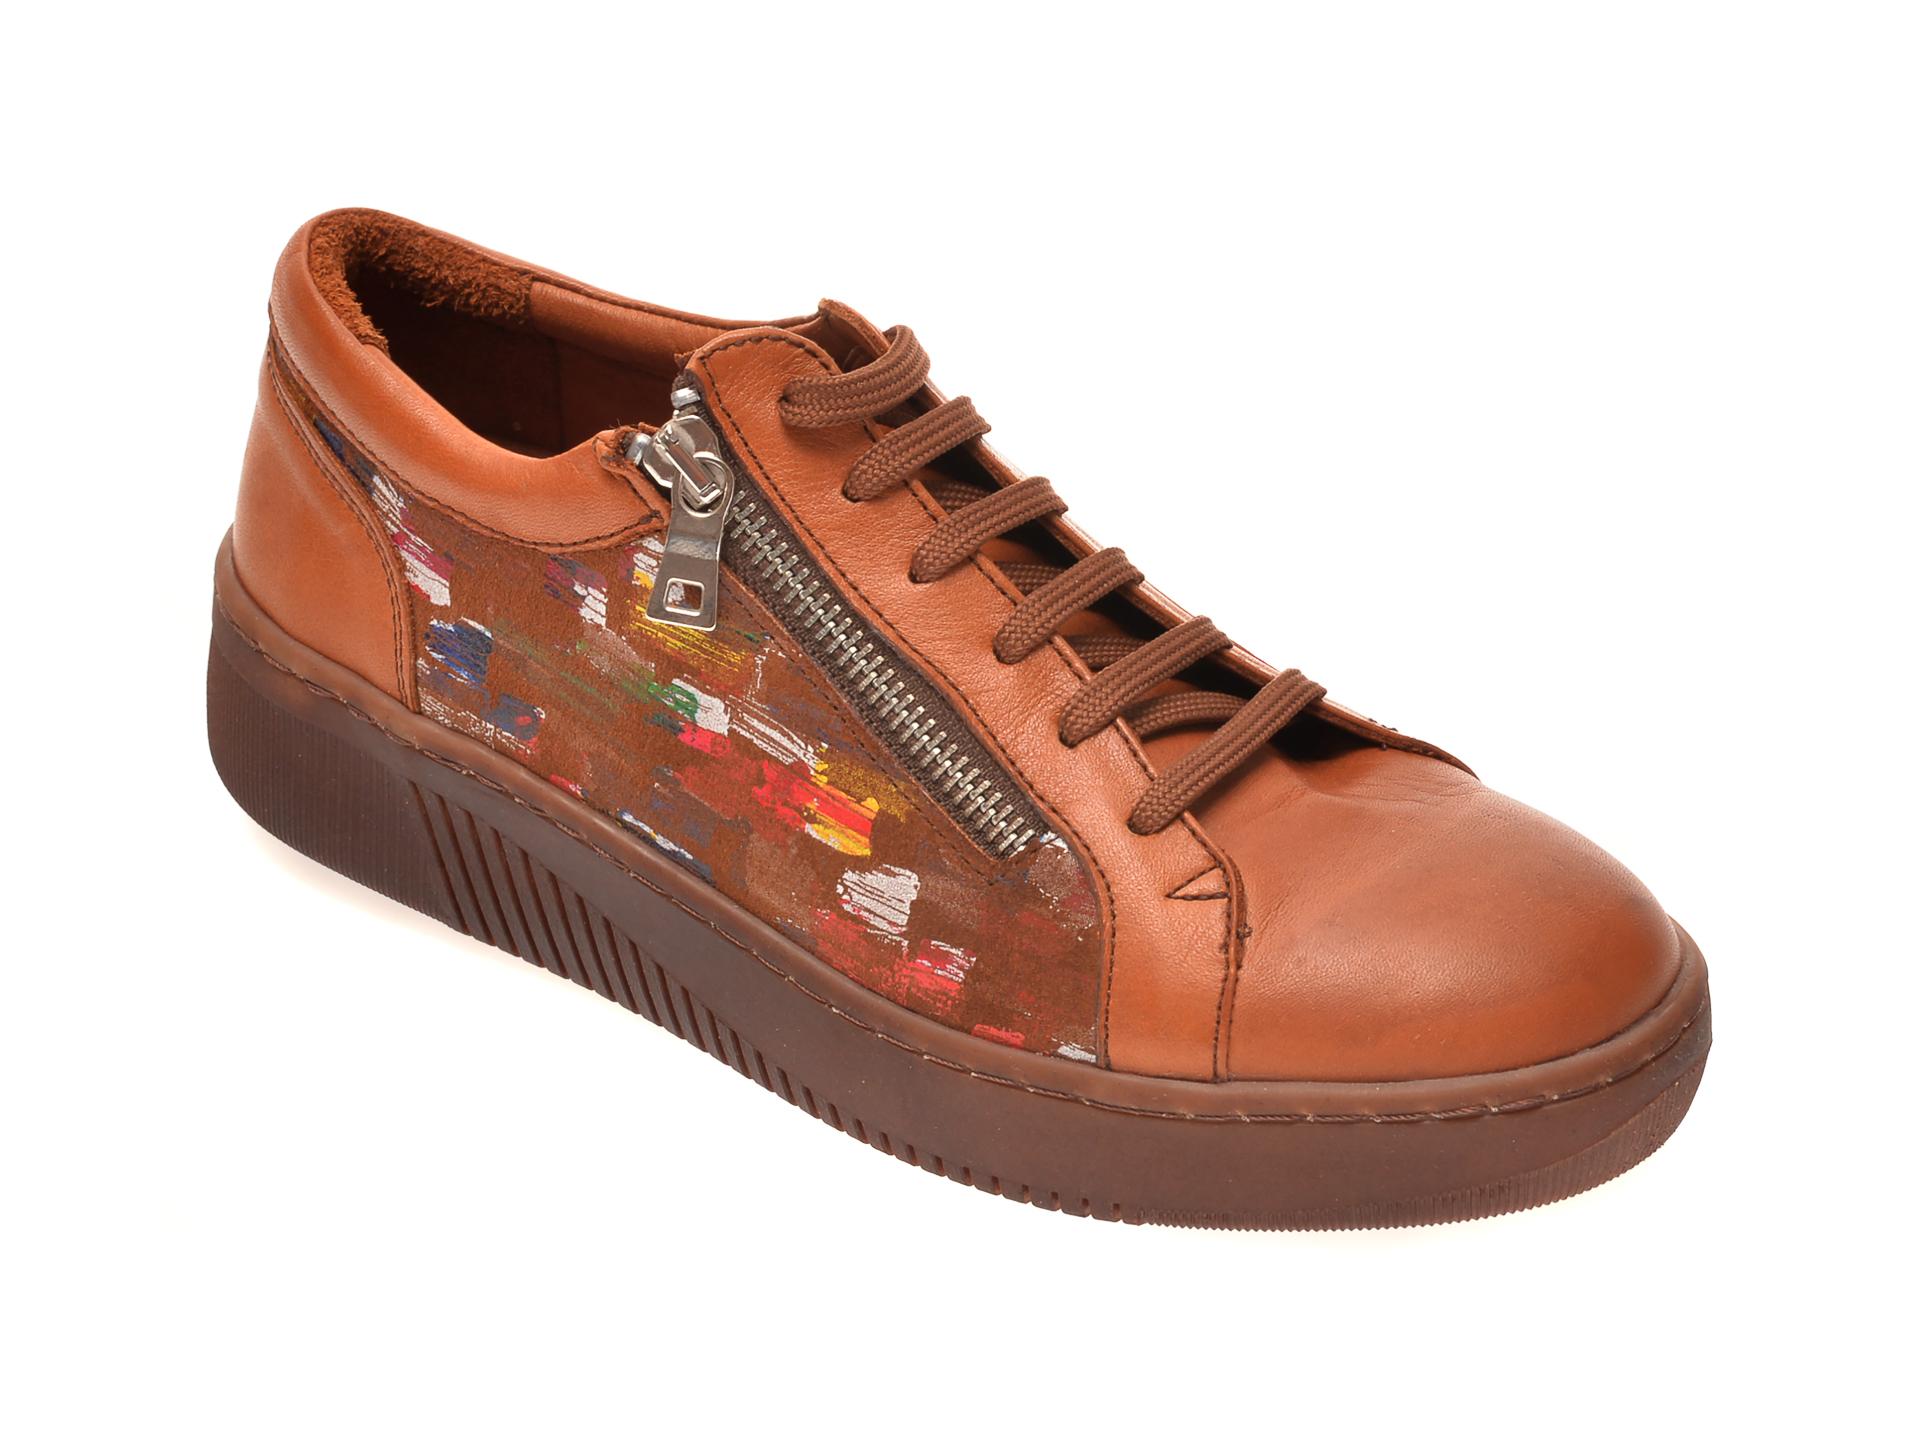 Pantofi PASS COLLECTION maro, 47529, din piele naturala New